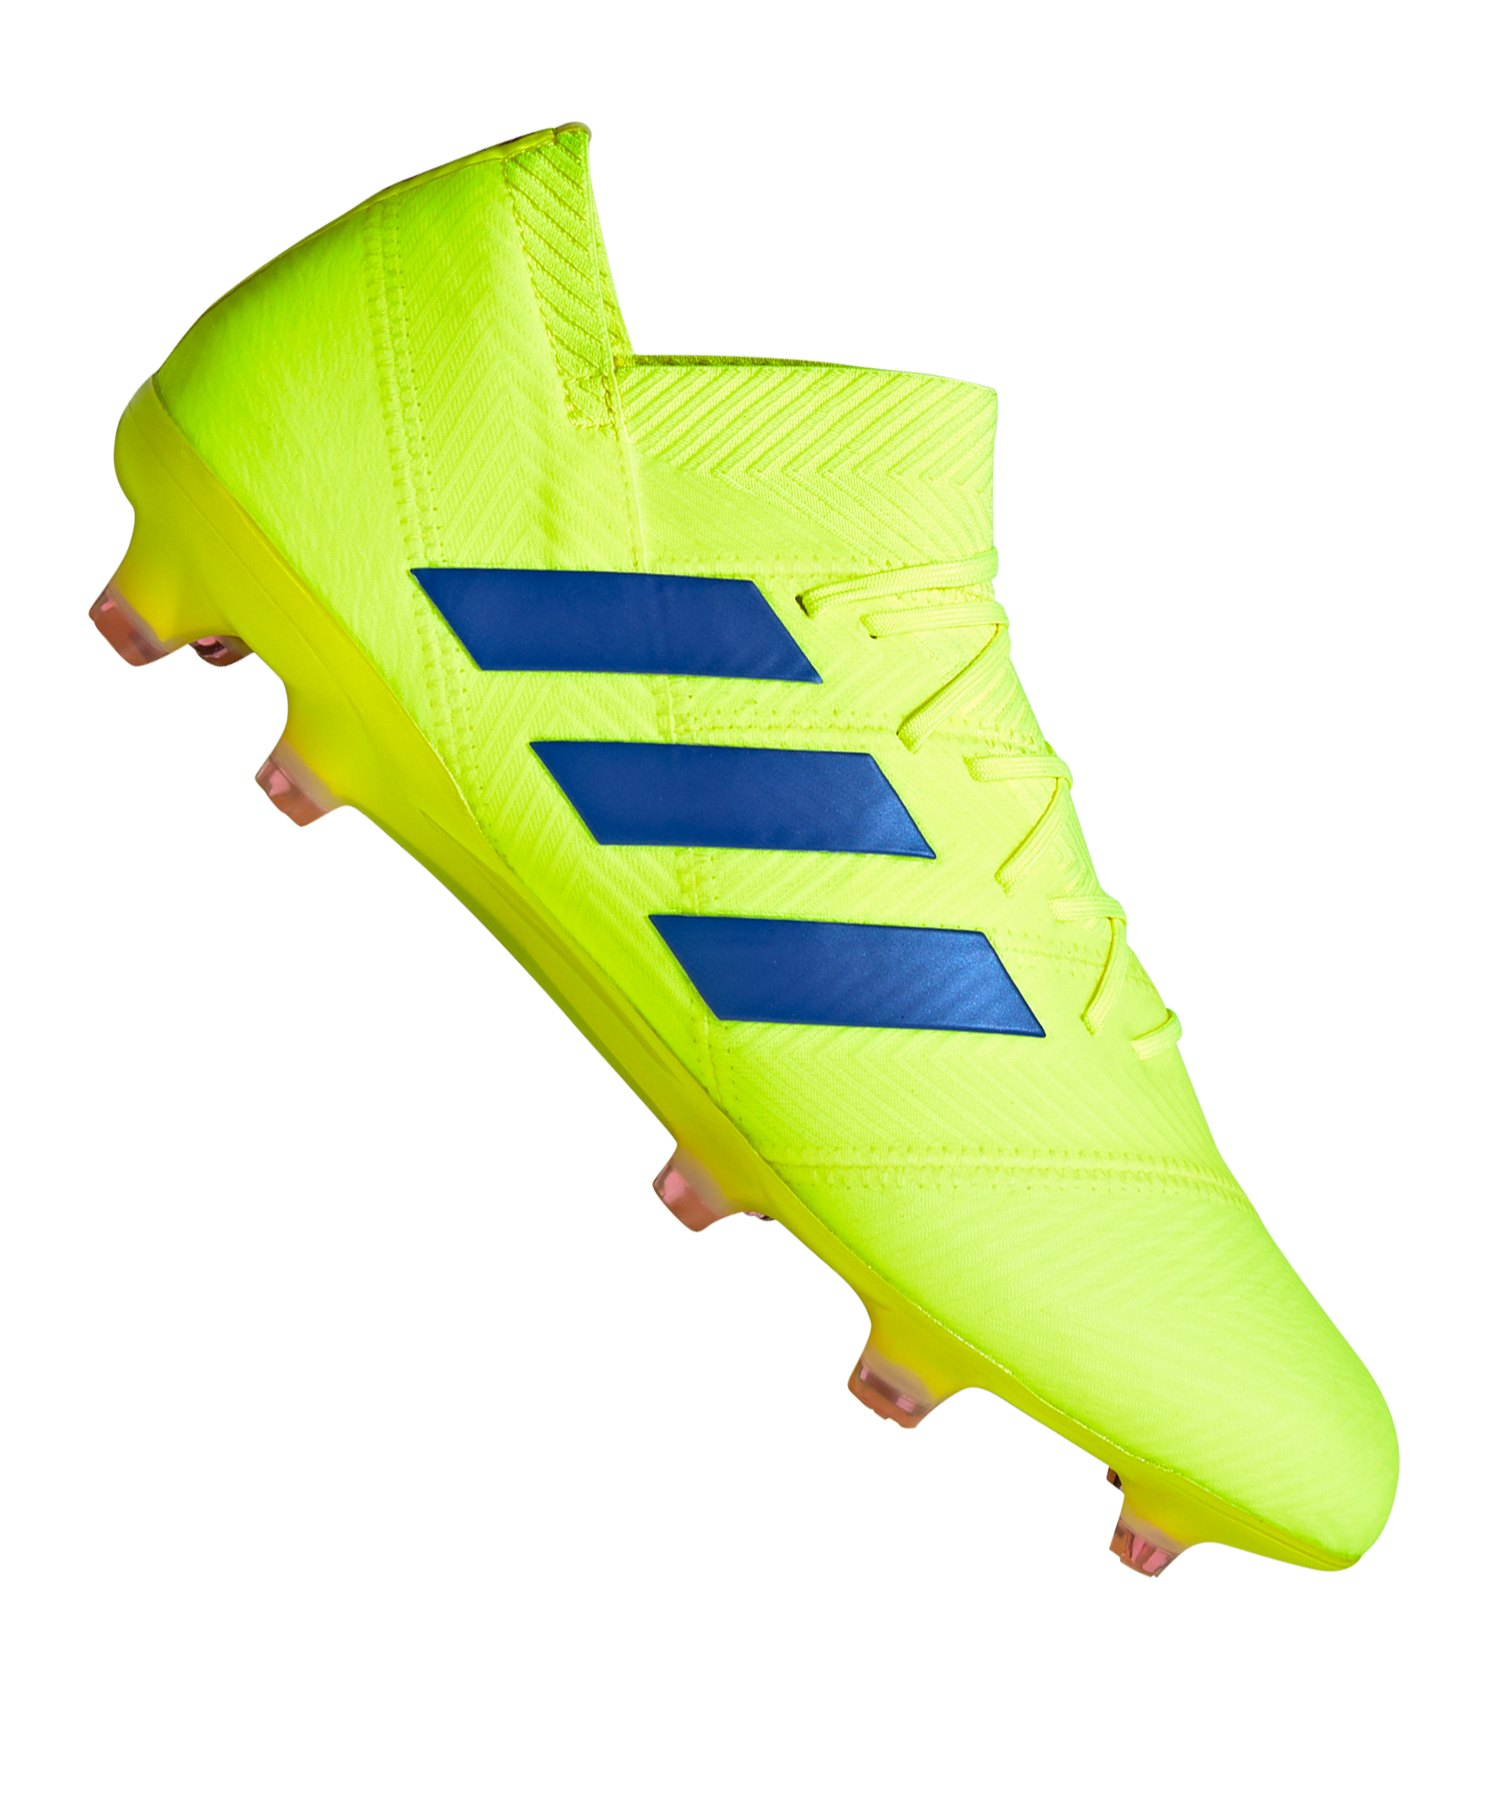 adidas NEMEZIZ 18.1 FG Gelb Blau - gelb